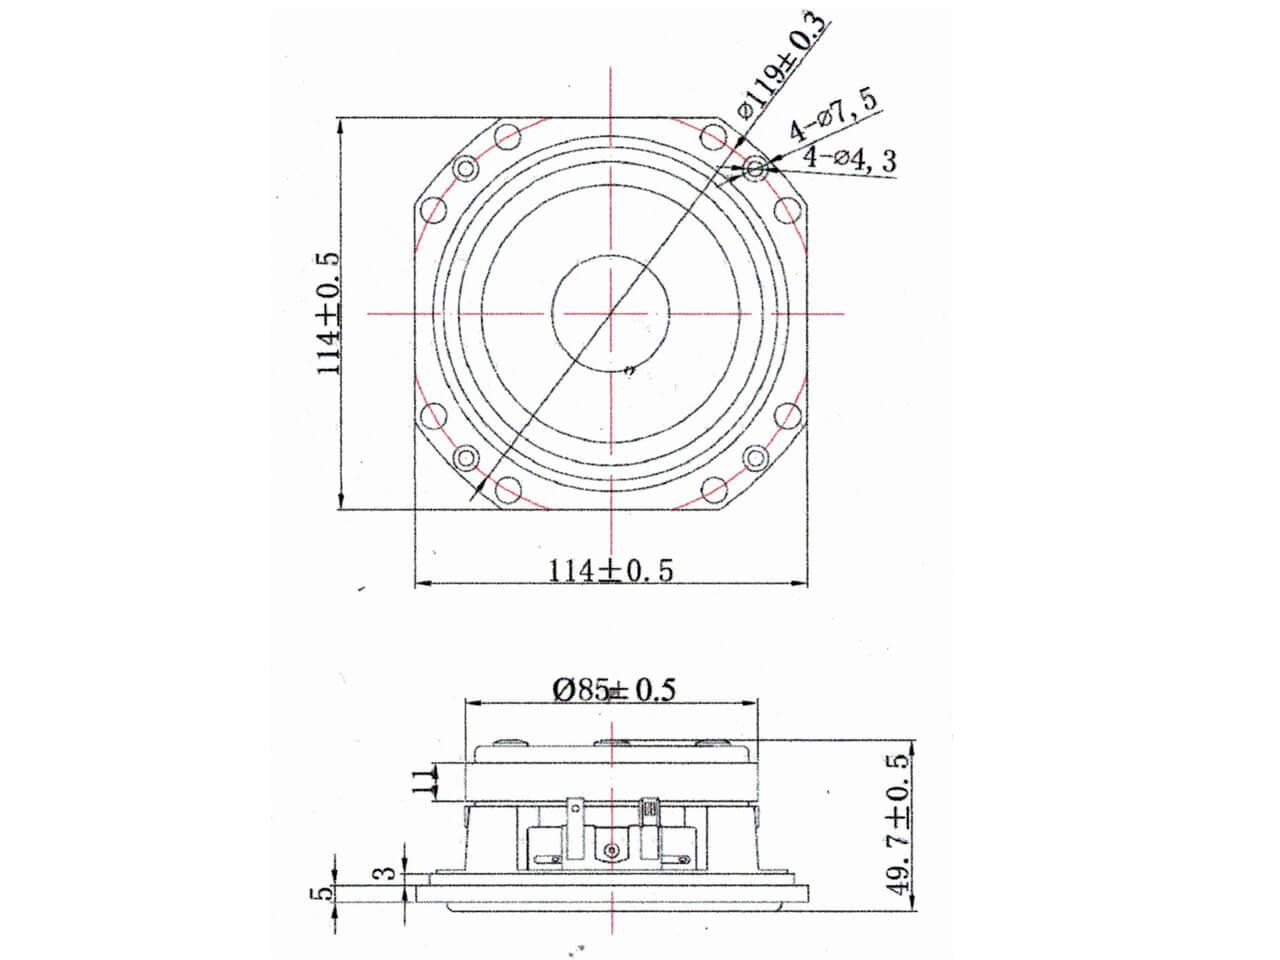 Jbl Le5 Midrange Copy For L80 L80t L80t3 L88 L222 Disco